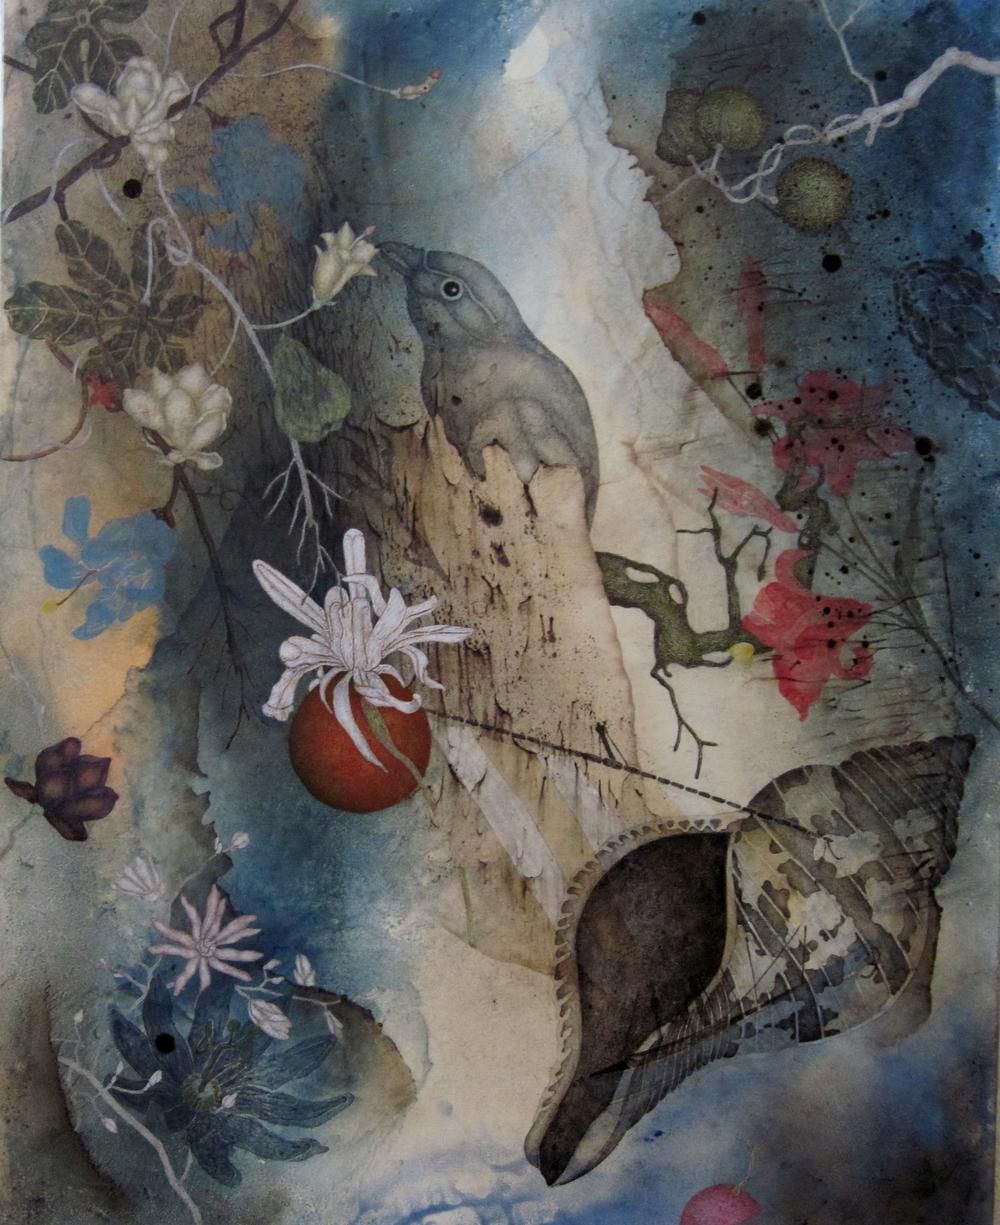 "Copy of Devil's Run (2016), 30"" x 24"", Oil, asphaltum, gold leaf, and encaustic on Okawara paper, mounted on canvas"